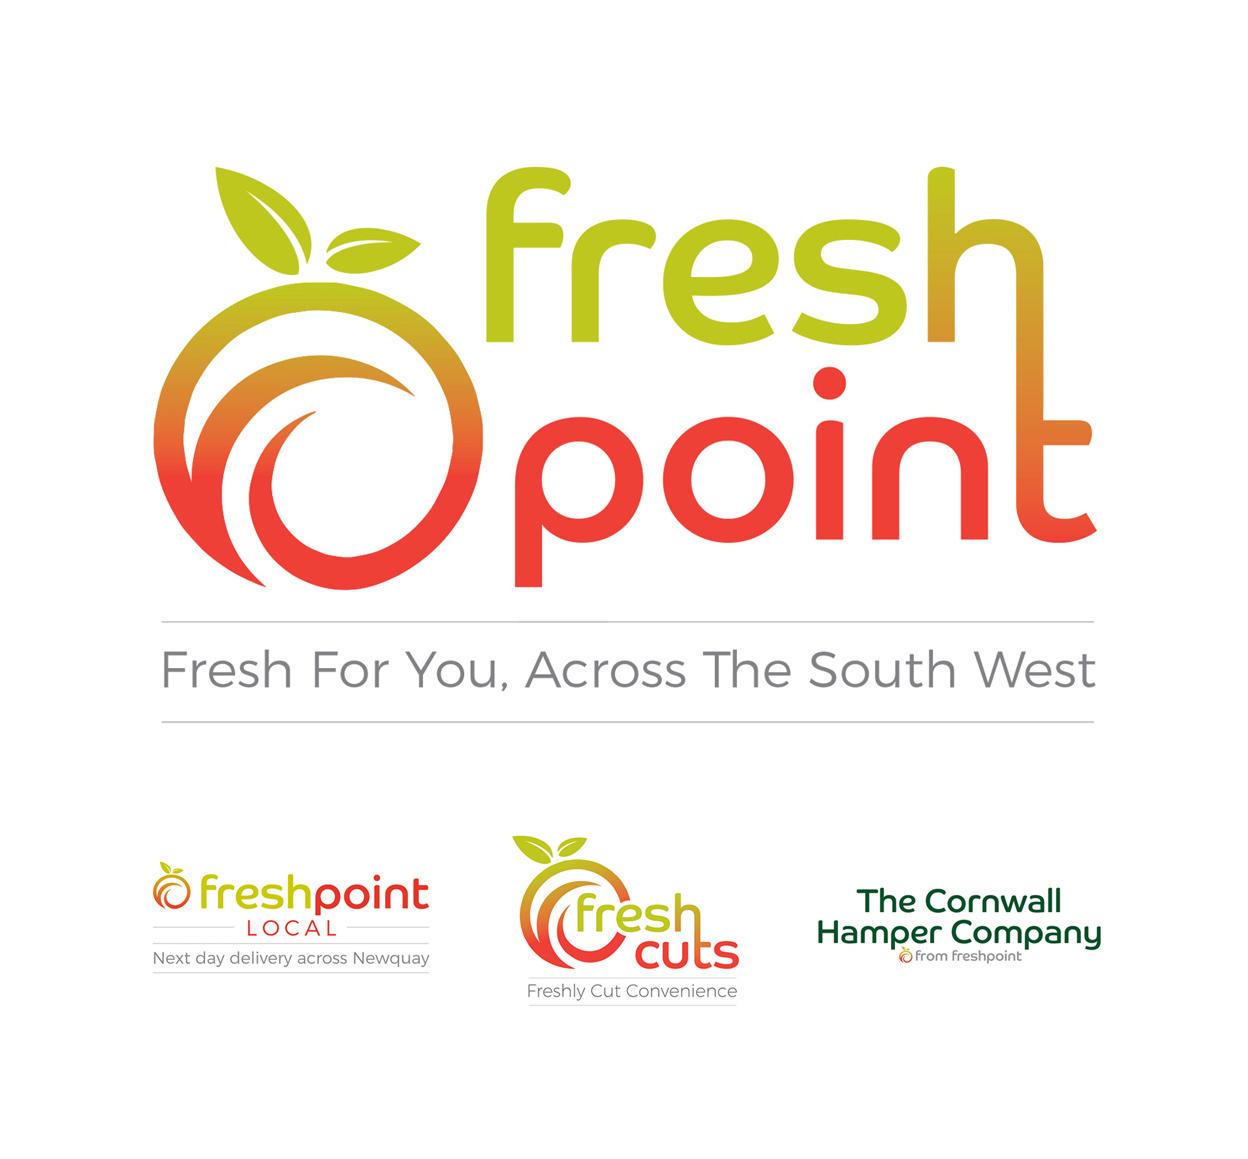 FreshPoint Brands design